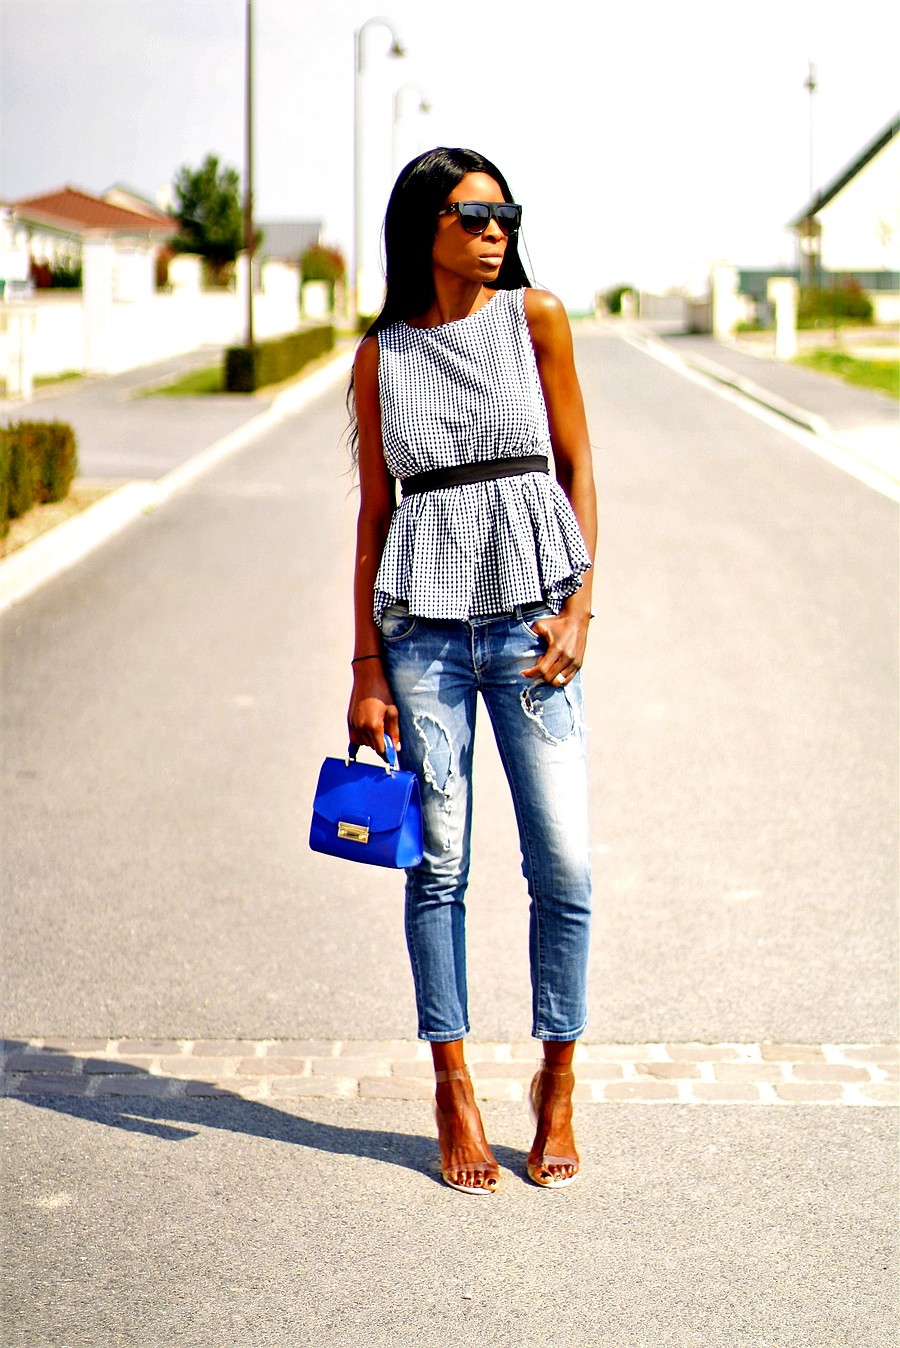 furla metropolis tendance vichy gingham tend jeans dechire sandales transparentes